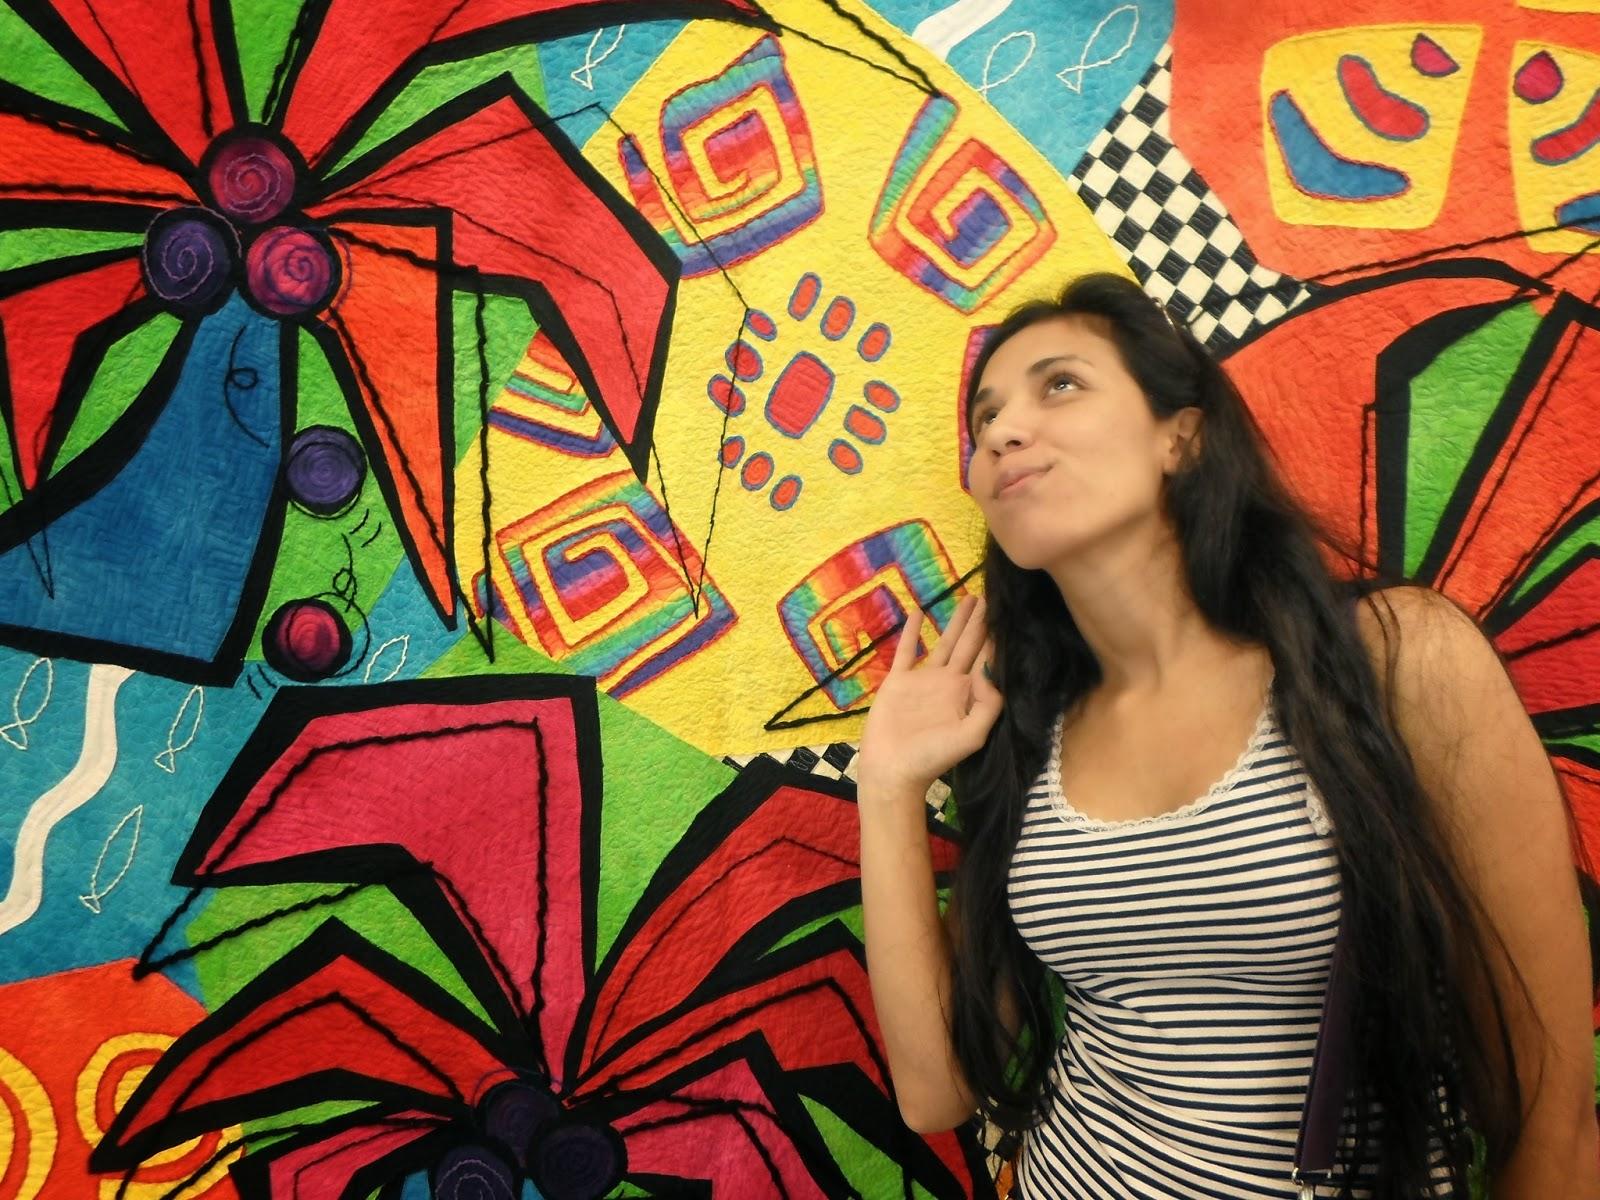 Brazil Scrapbooking e Brazil Patchwork Show -  donna rita